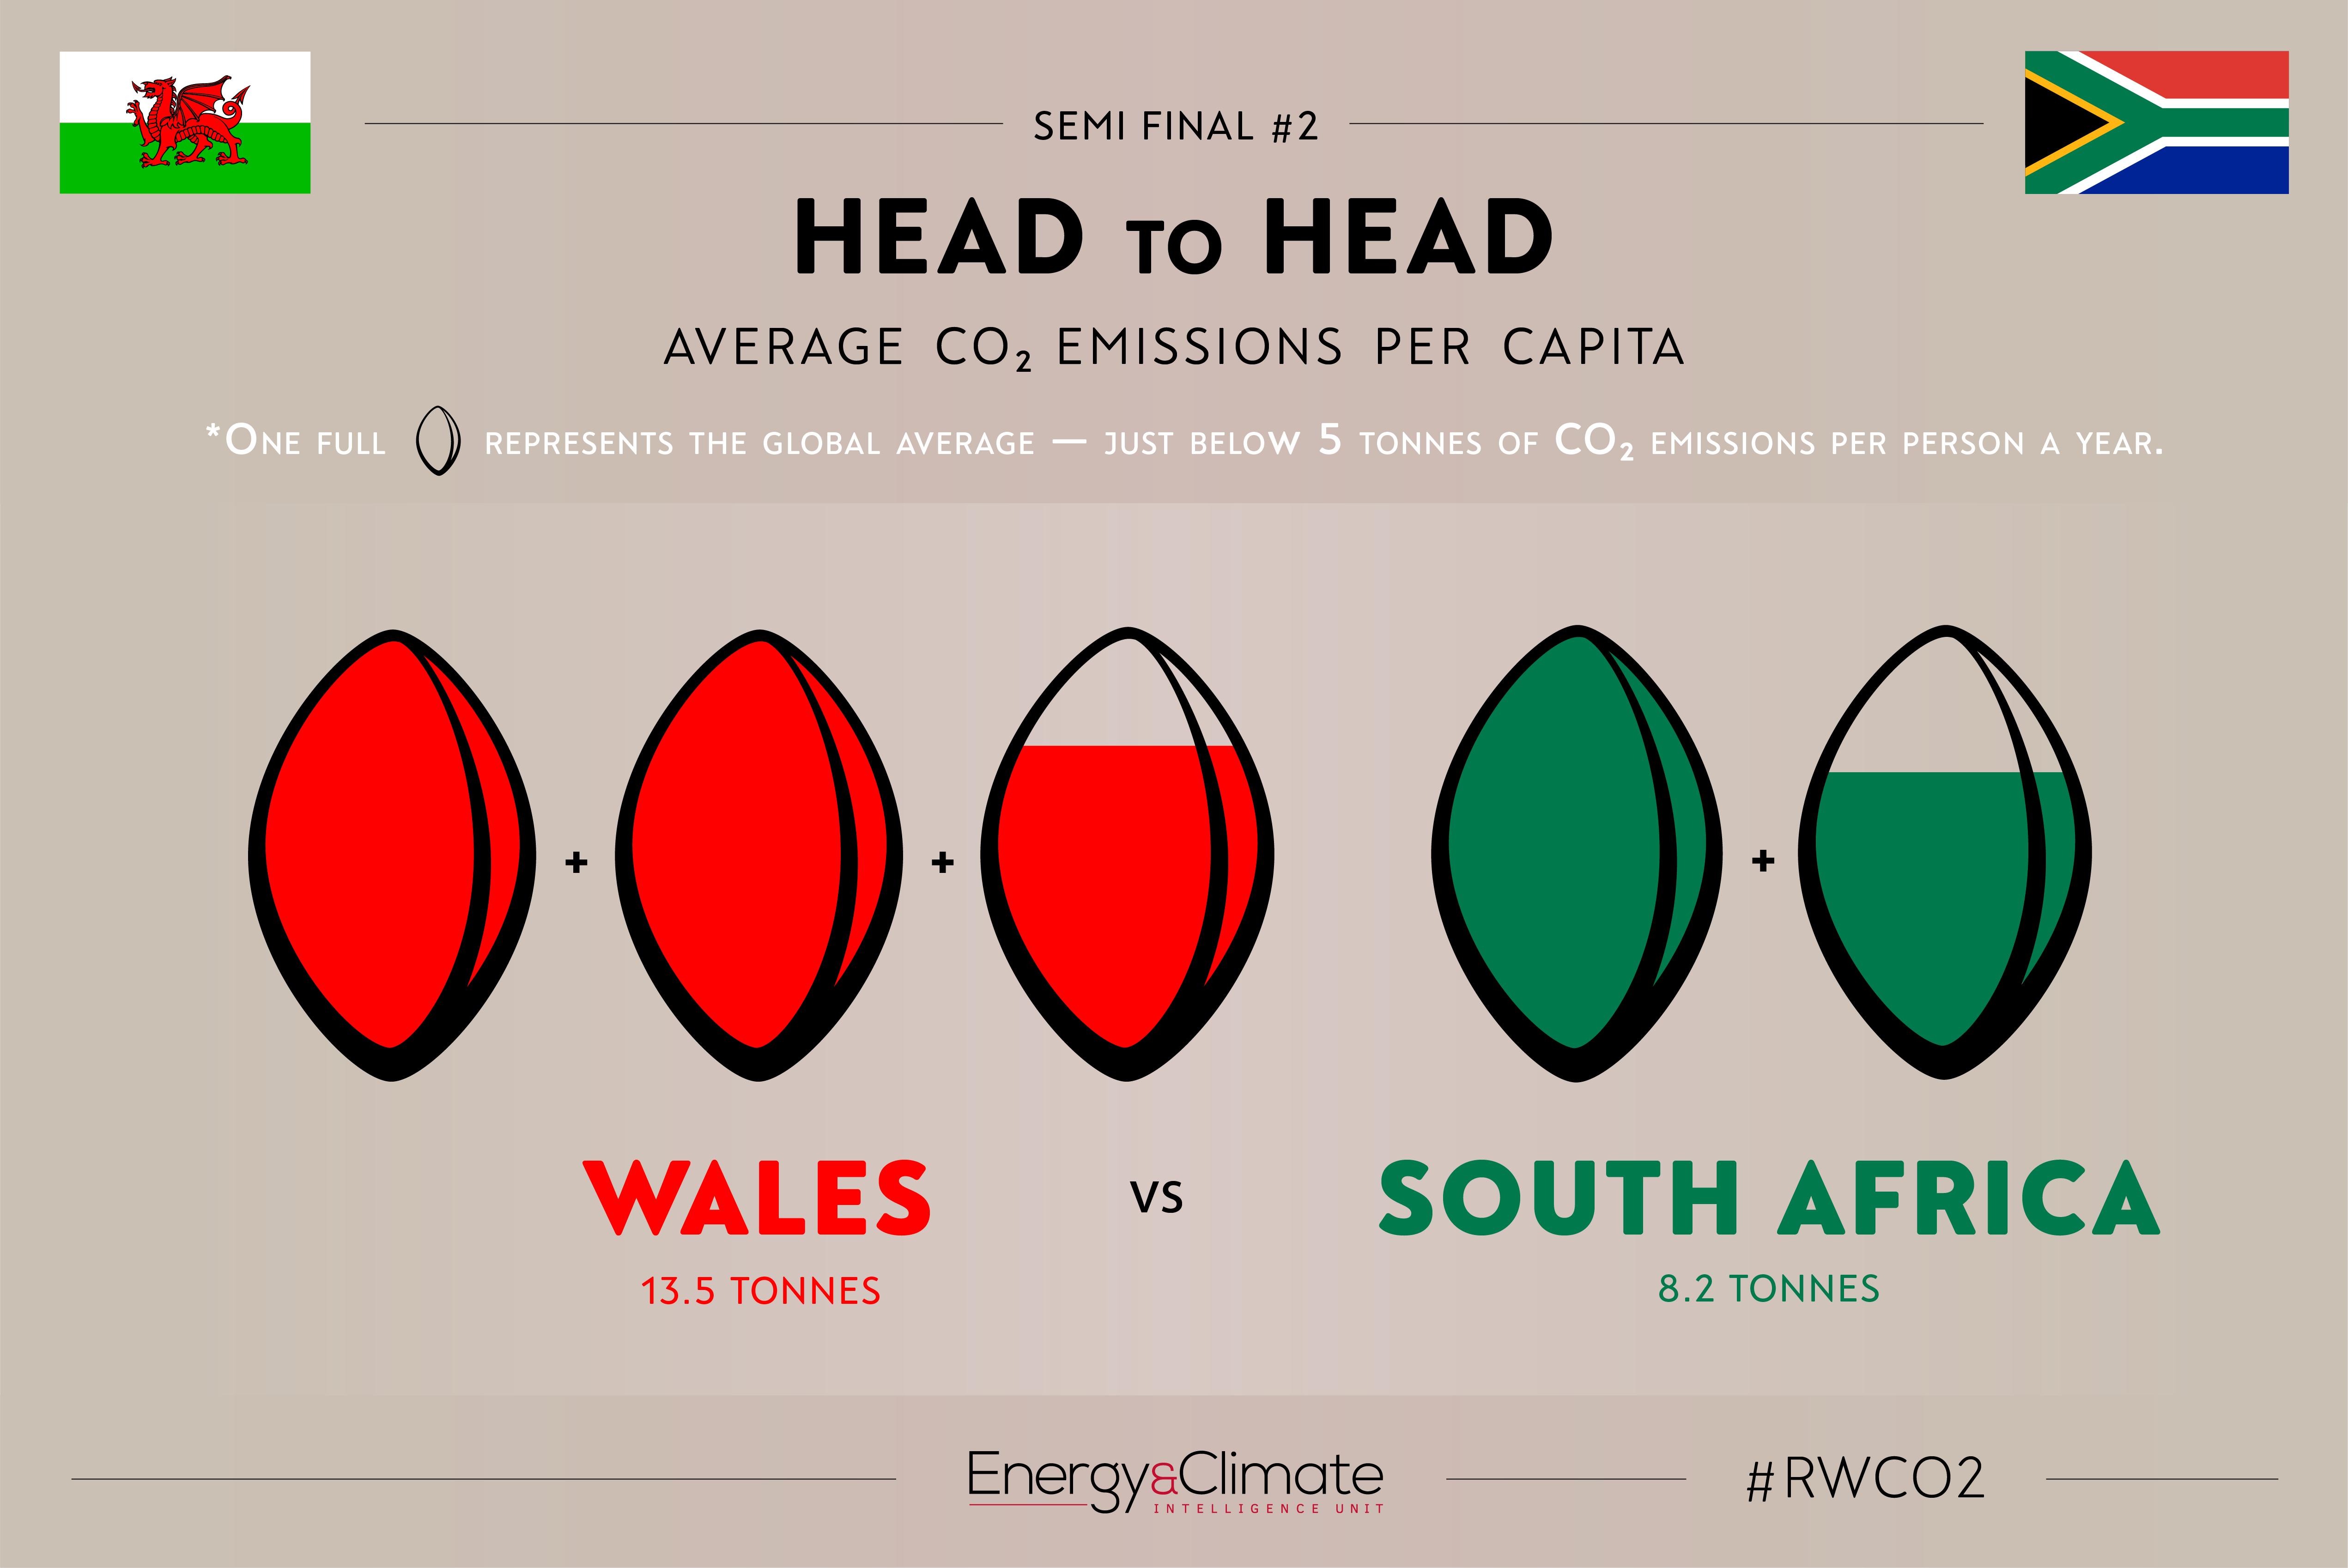 Wales v South Africa - per capita emissions